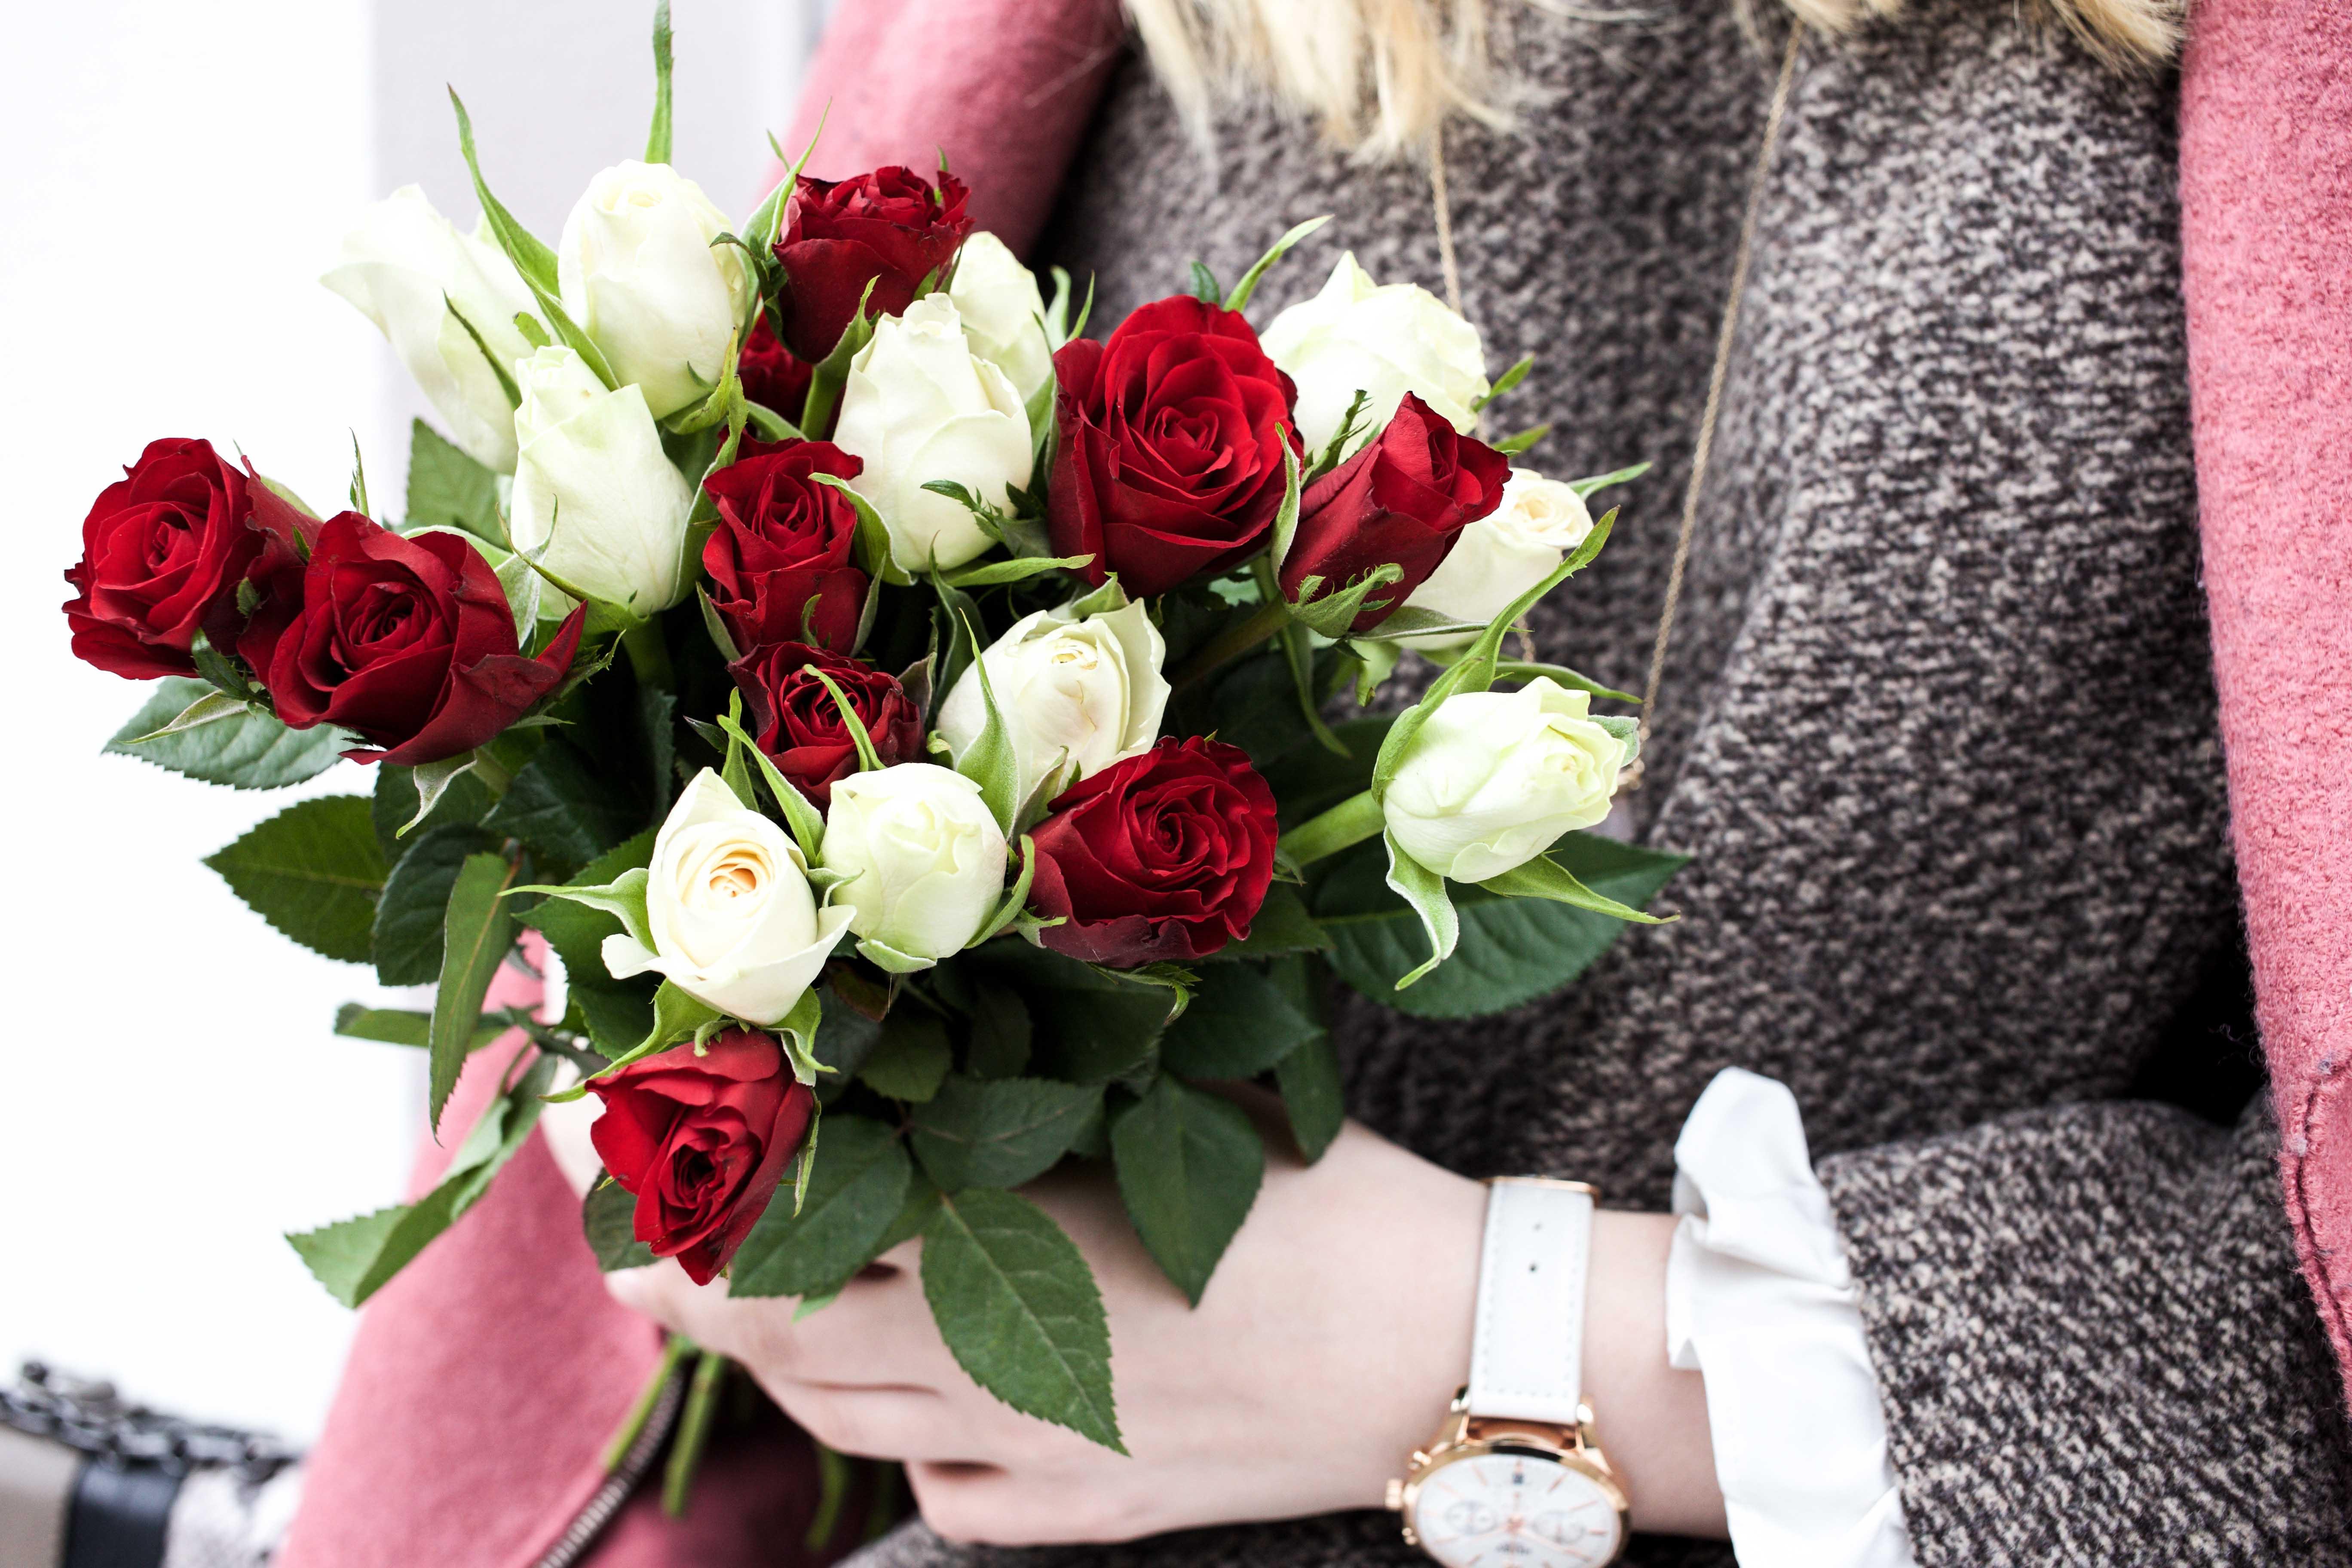 be-my-valentine-romantisches-valentinstags-outfit-valentinstag-inspiration-fashionblog_0293